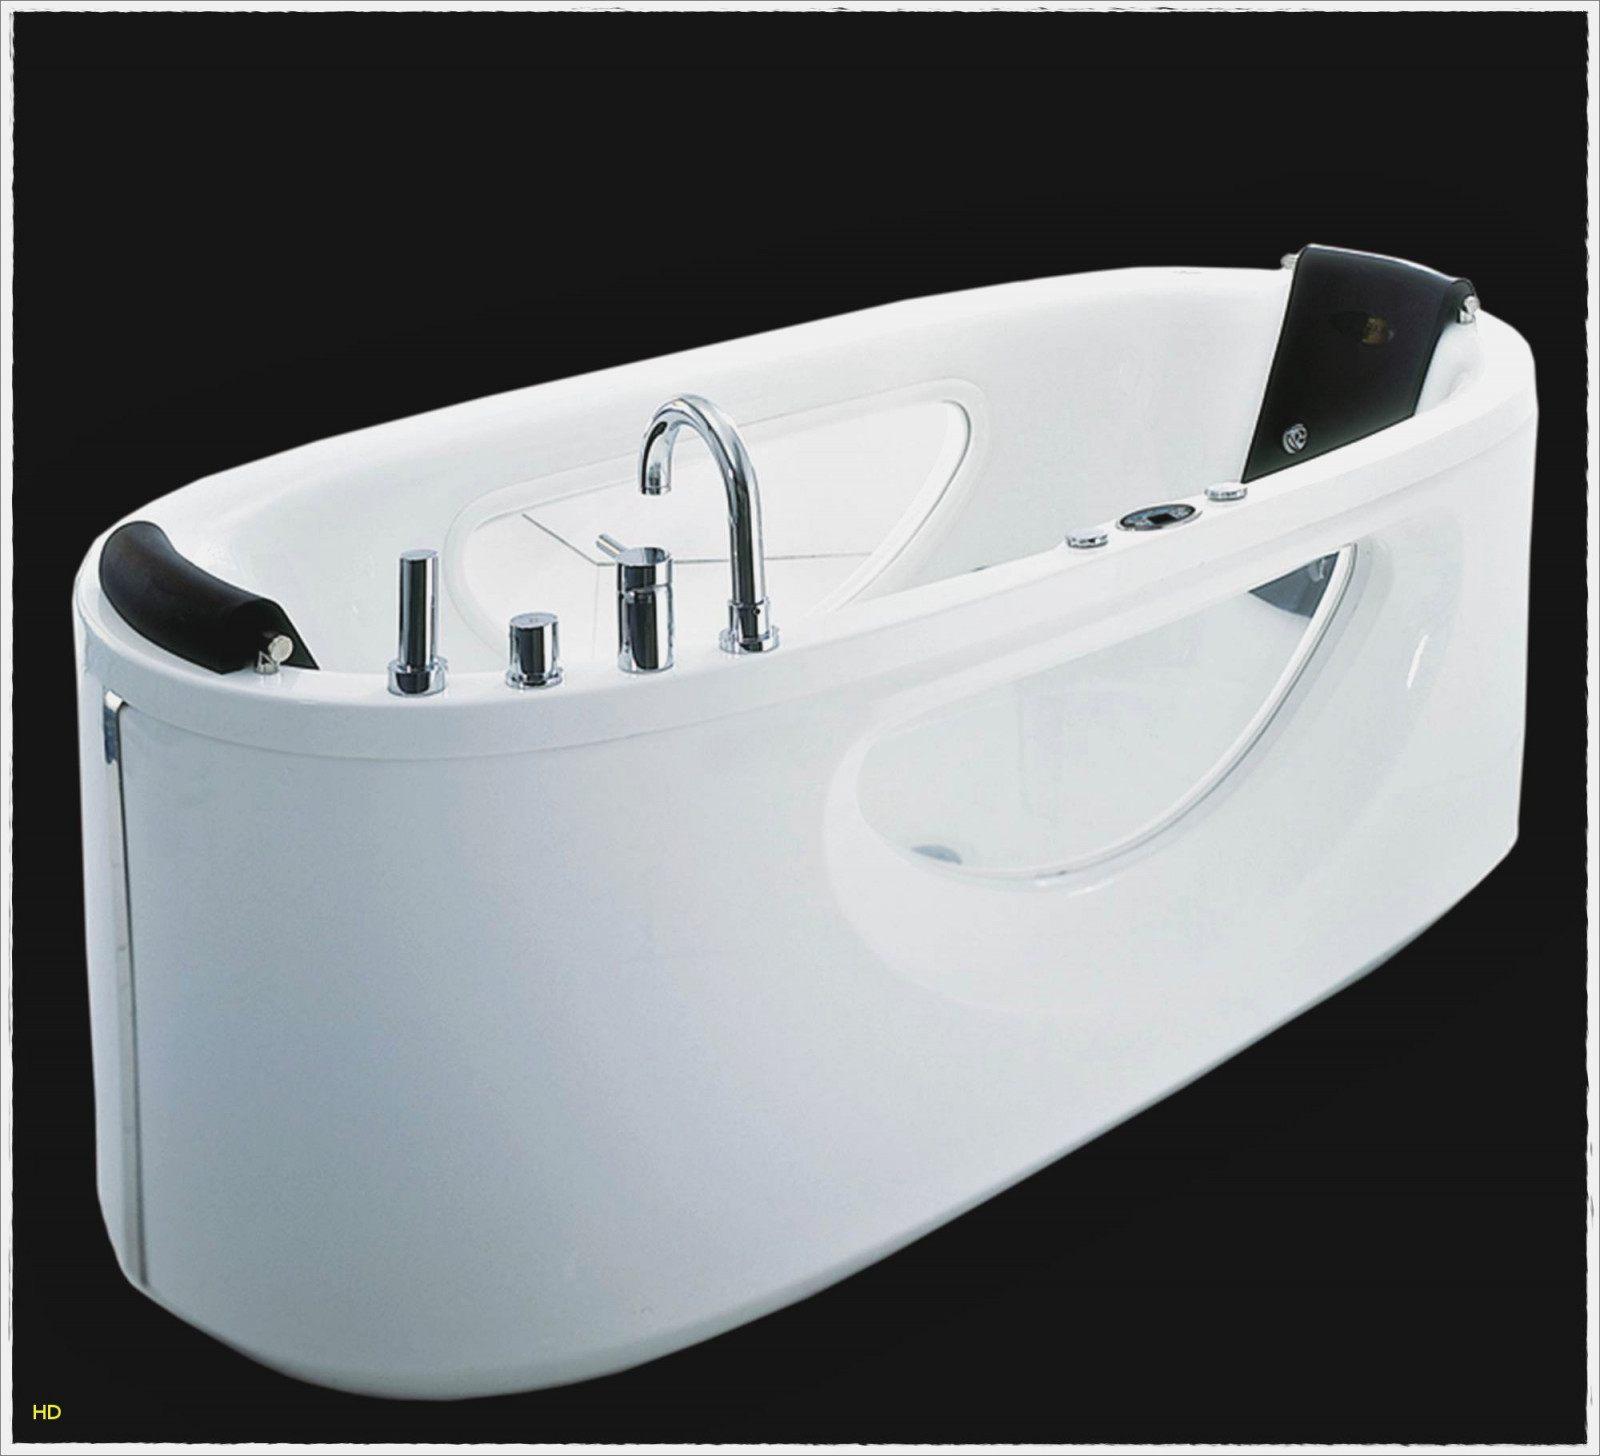 Cale Bebe Lit Impressionnant Cale Bebe Baignoire Belle Baignoire Roca Contesa 8 Best Bathroom